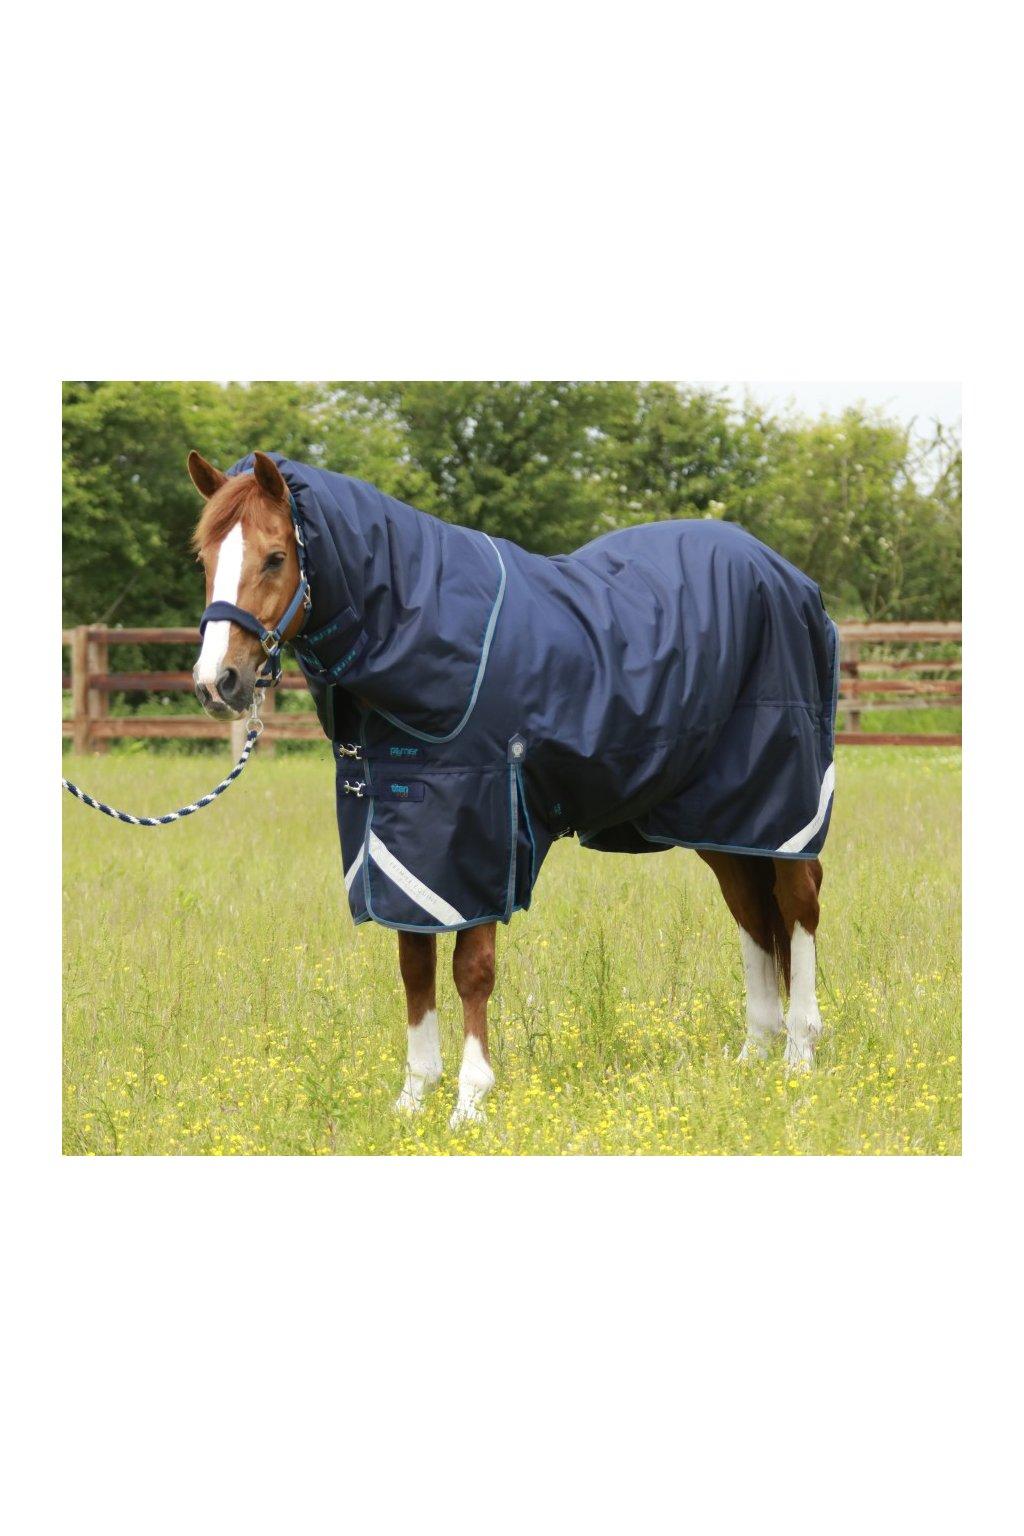 Nepromokavá deka Titan 200g Premier Equine